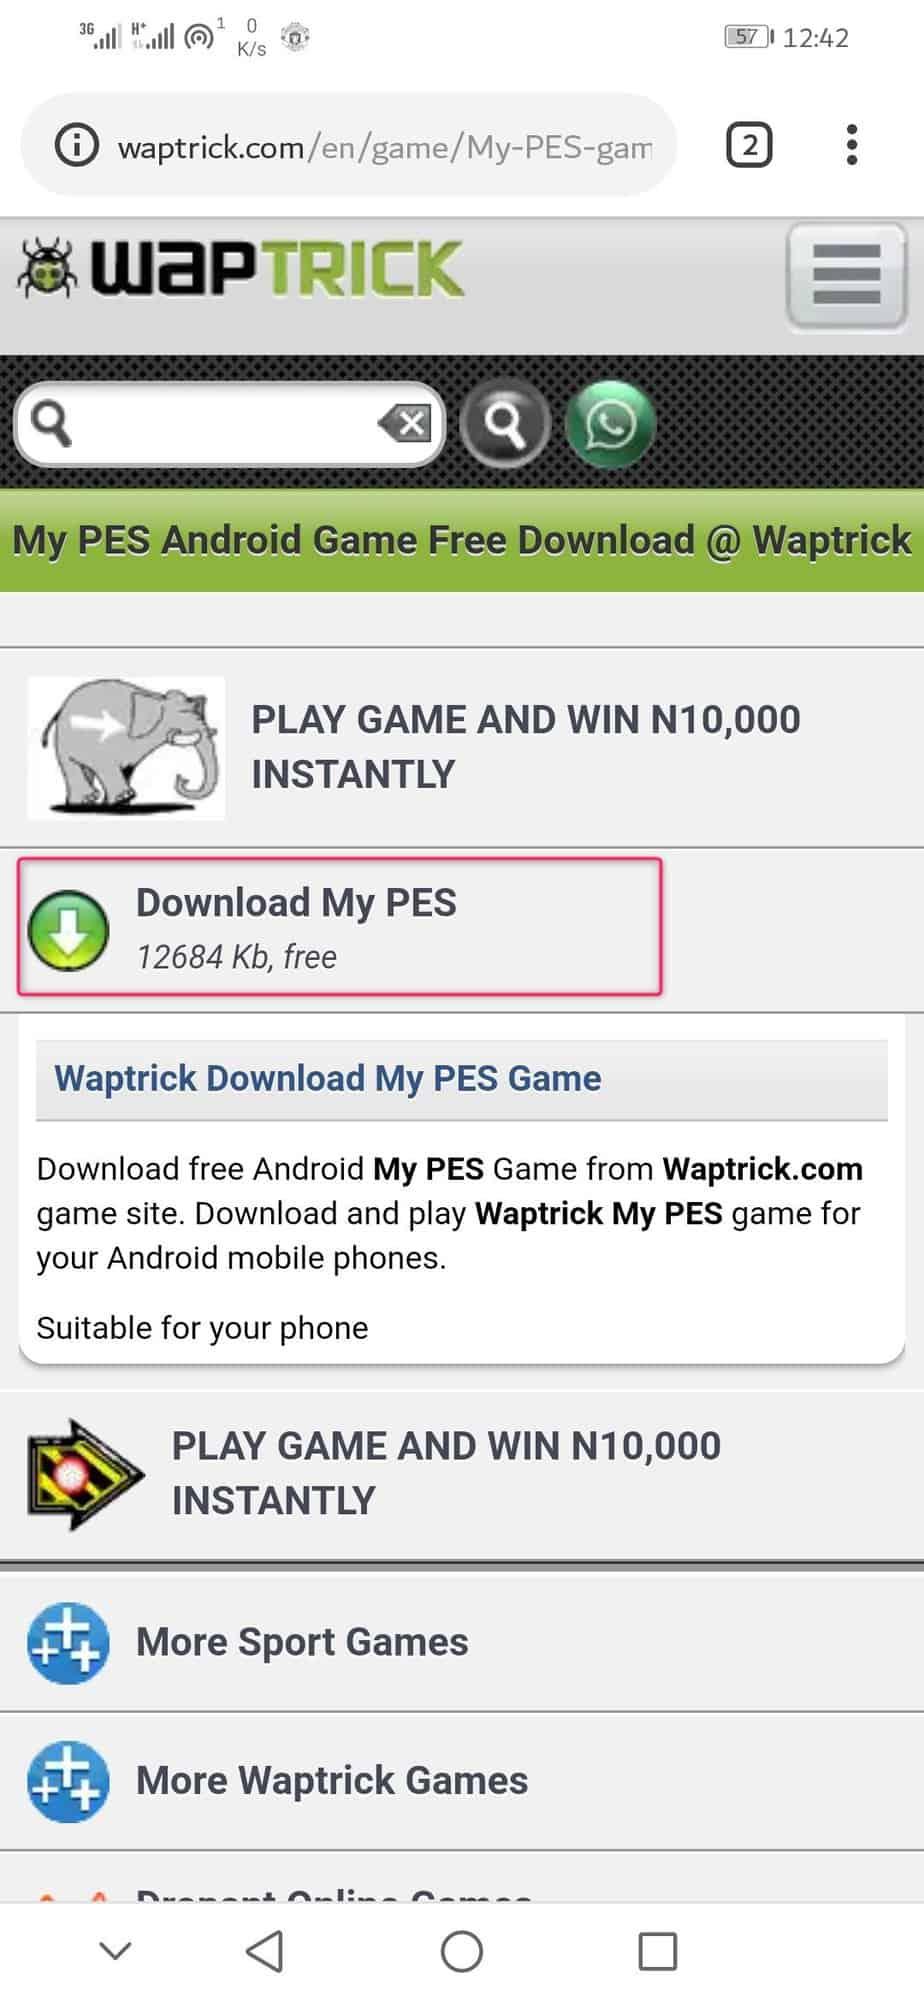 www waptrick com: Download Games, videos, MP4, 3gp - Gadgets